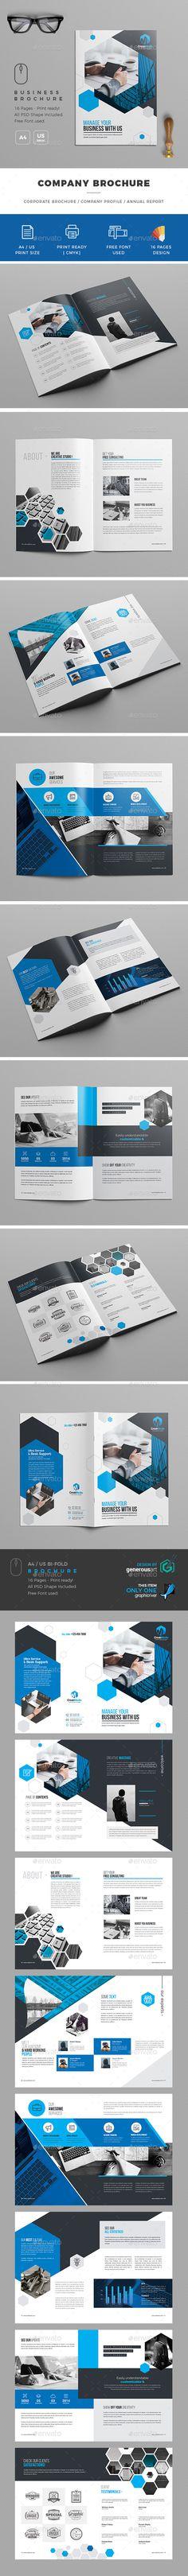 Business Brochure — Photoshop PSD #business #horizontal • Download ➝ https://graphicriver.net/item/business-brochure/19587301?ref=pxcr